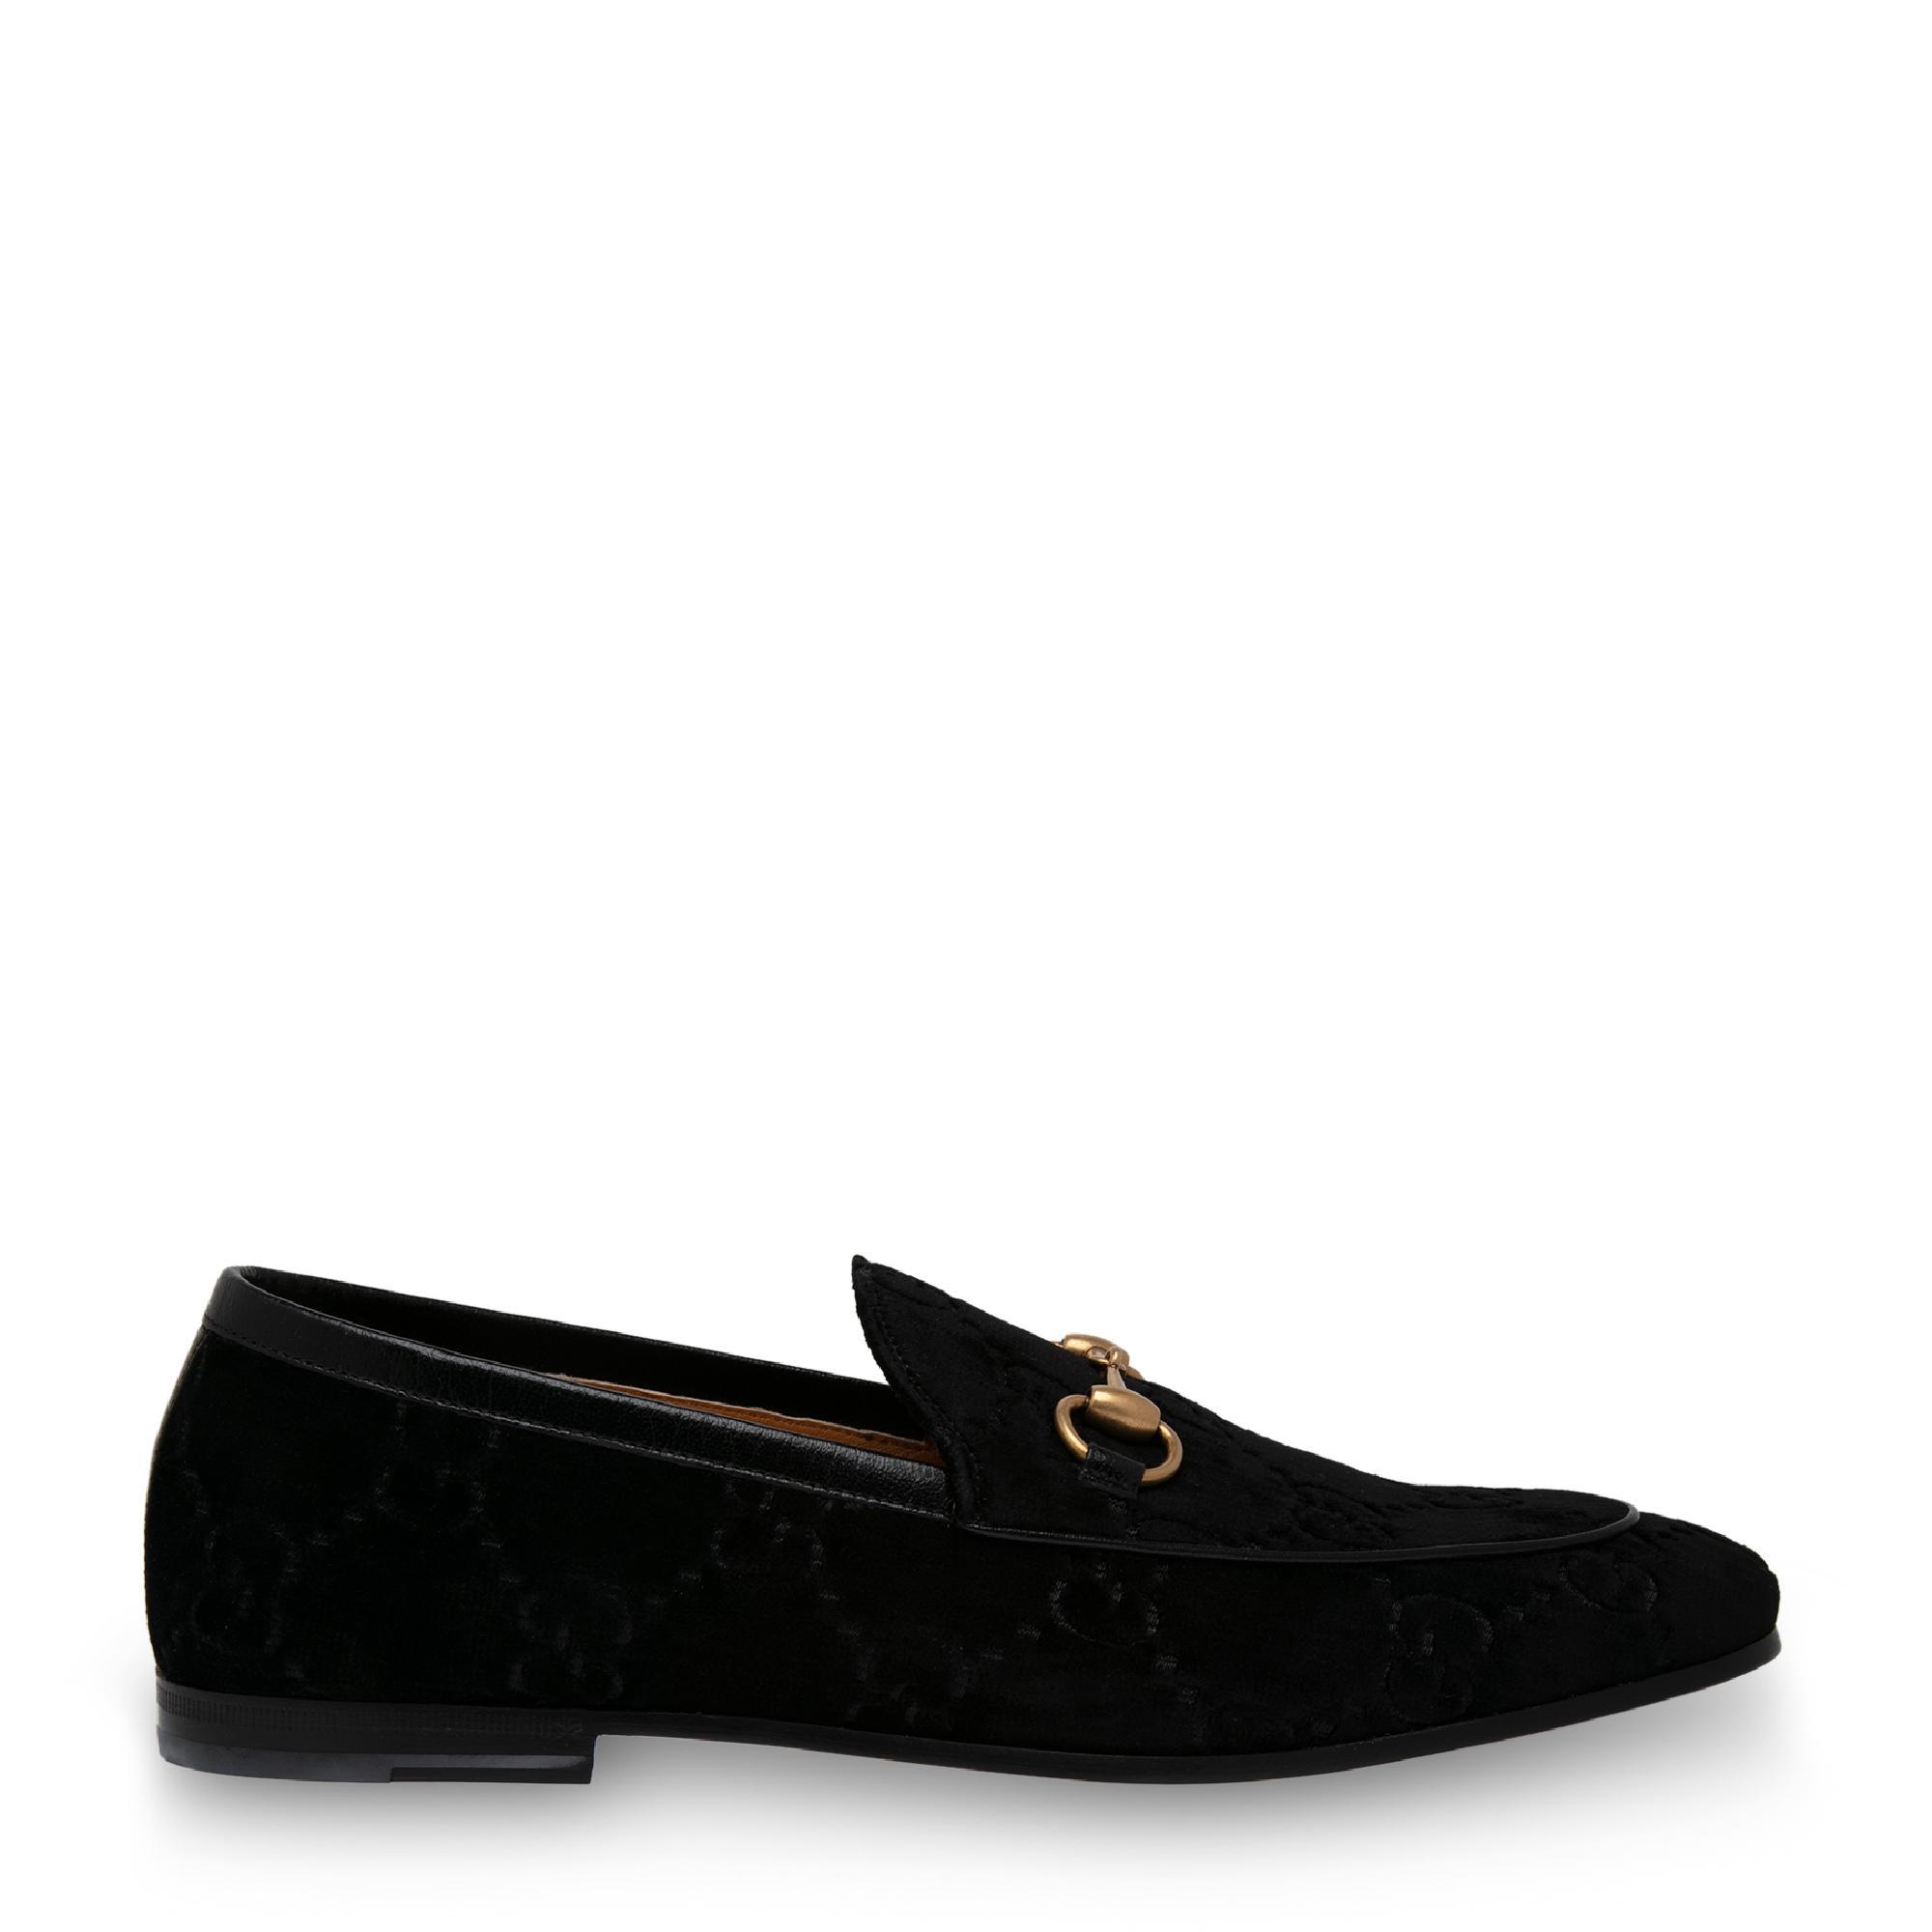 Jordaan GG velvet loafers